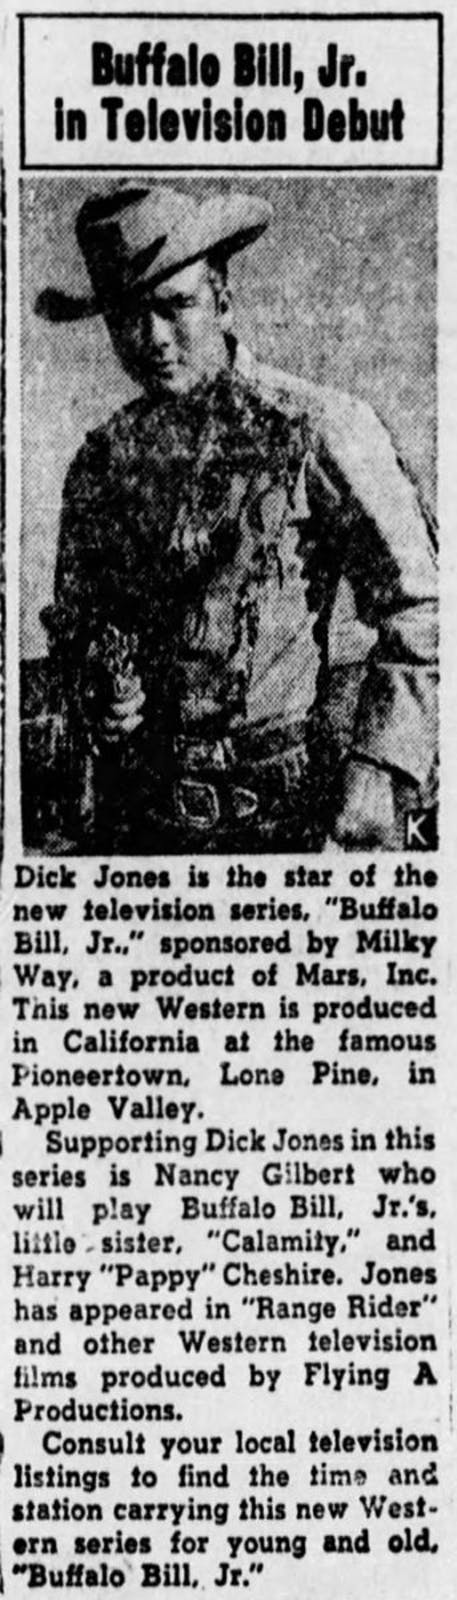 Mar. 24, 1955 - Sullivan Tri County News